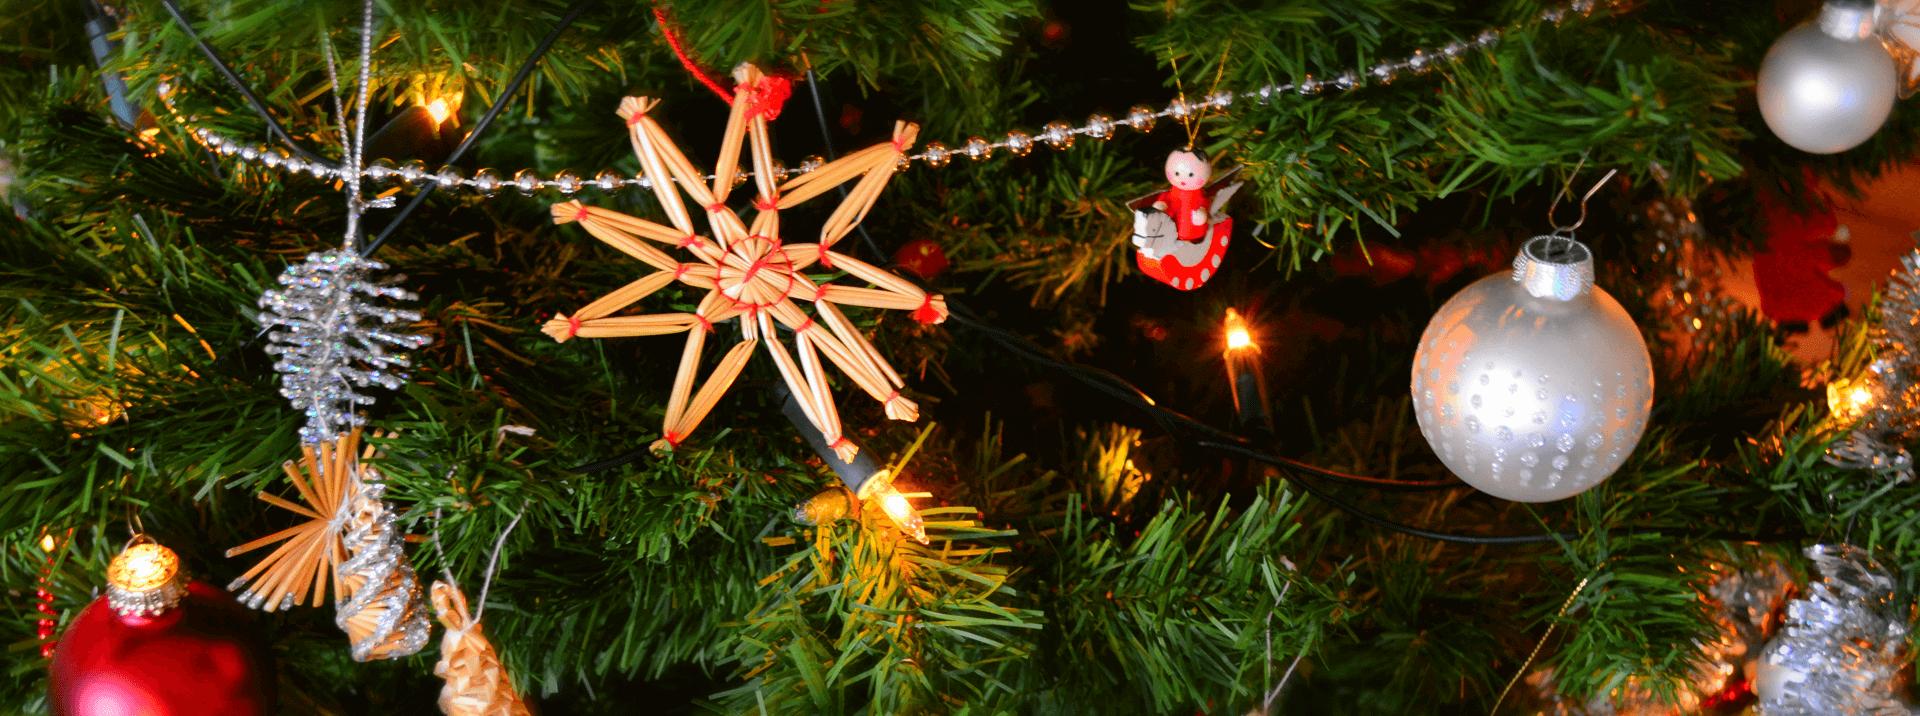 royalty free christmas music 0 weihnachtsmusik playlisten - Christmas Music Free